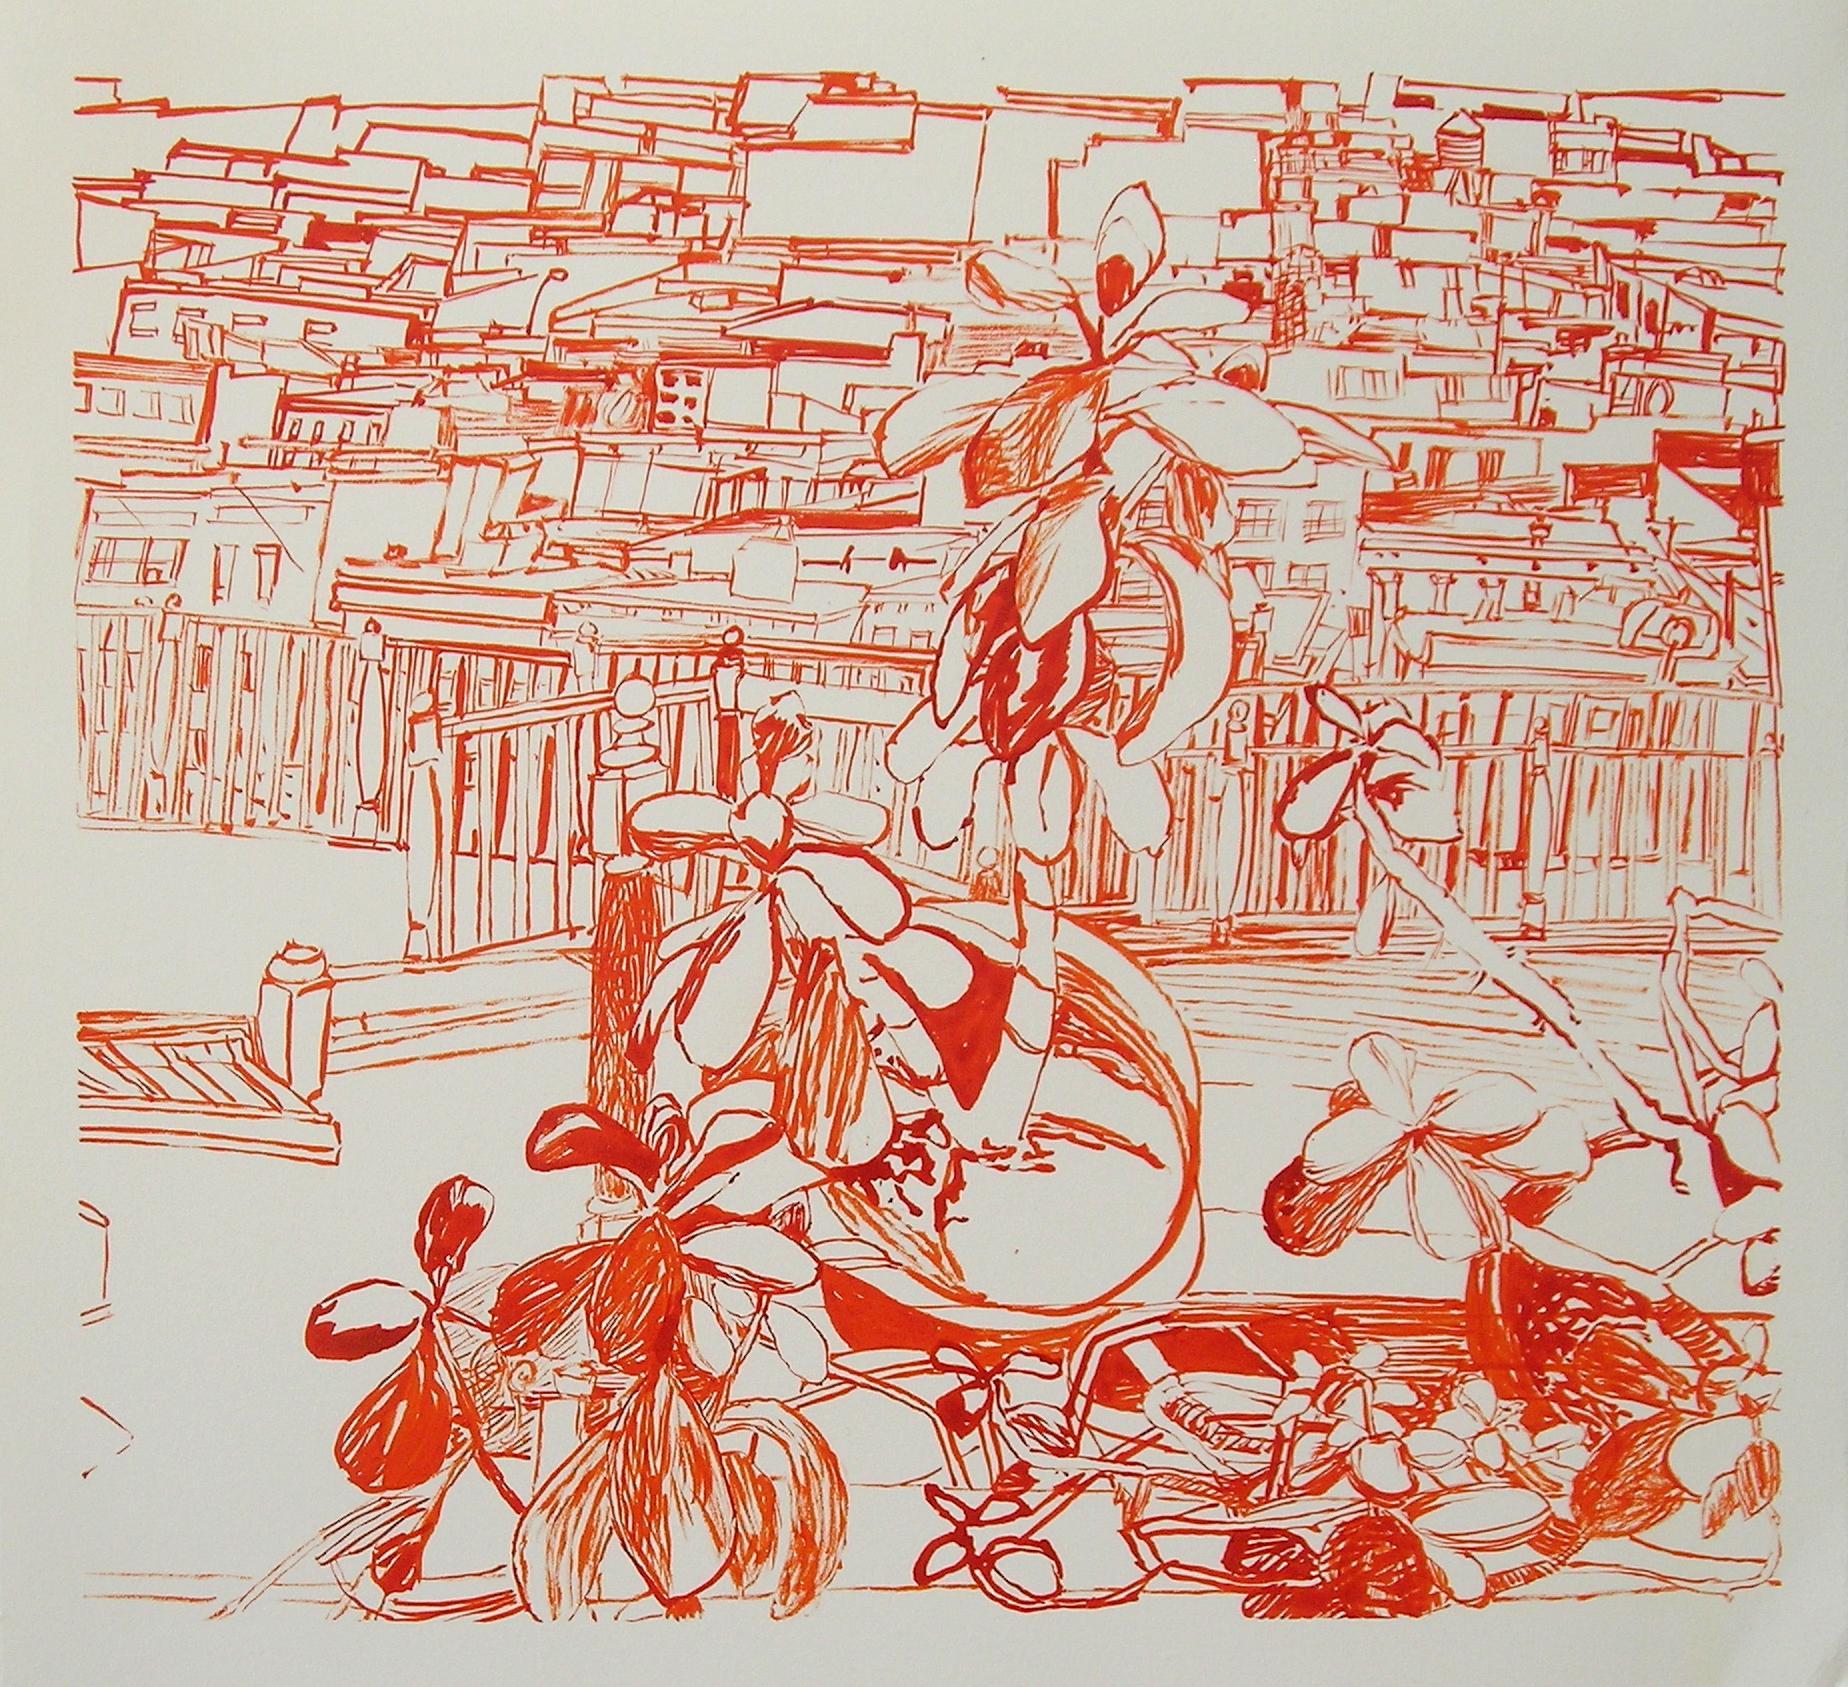 Josette Urso, Broken, 2018, Ink Brush Drawing, 12 x 13 in